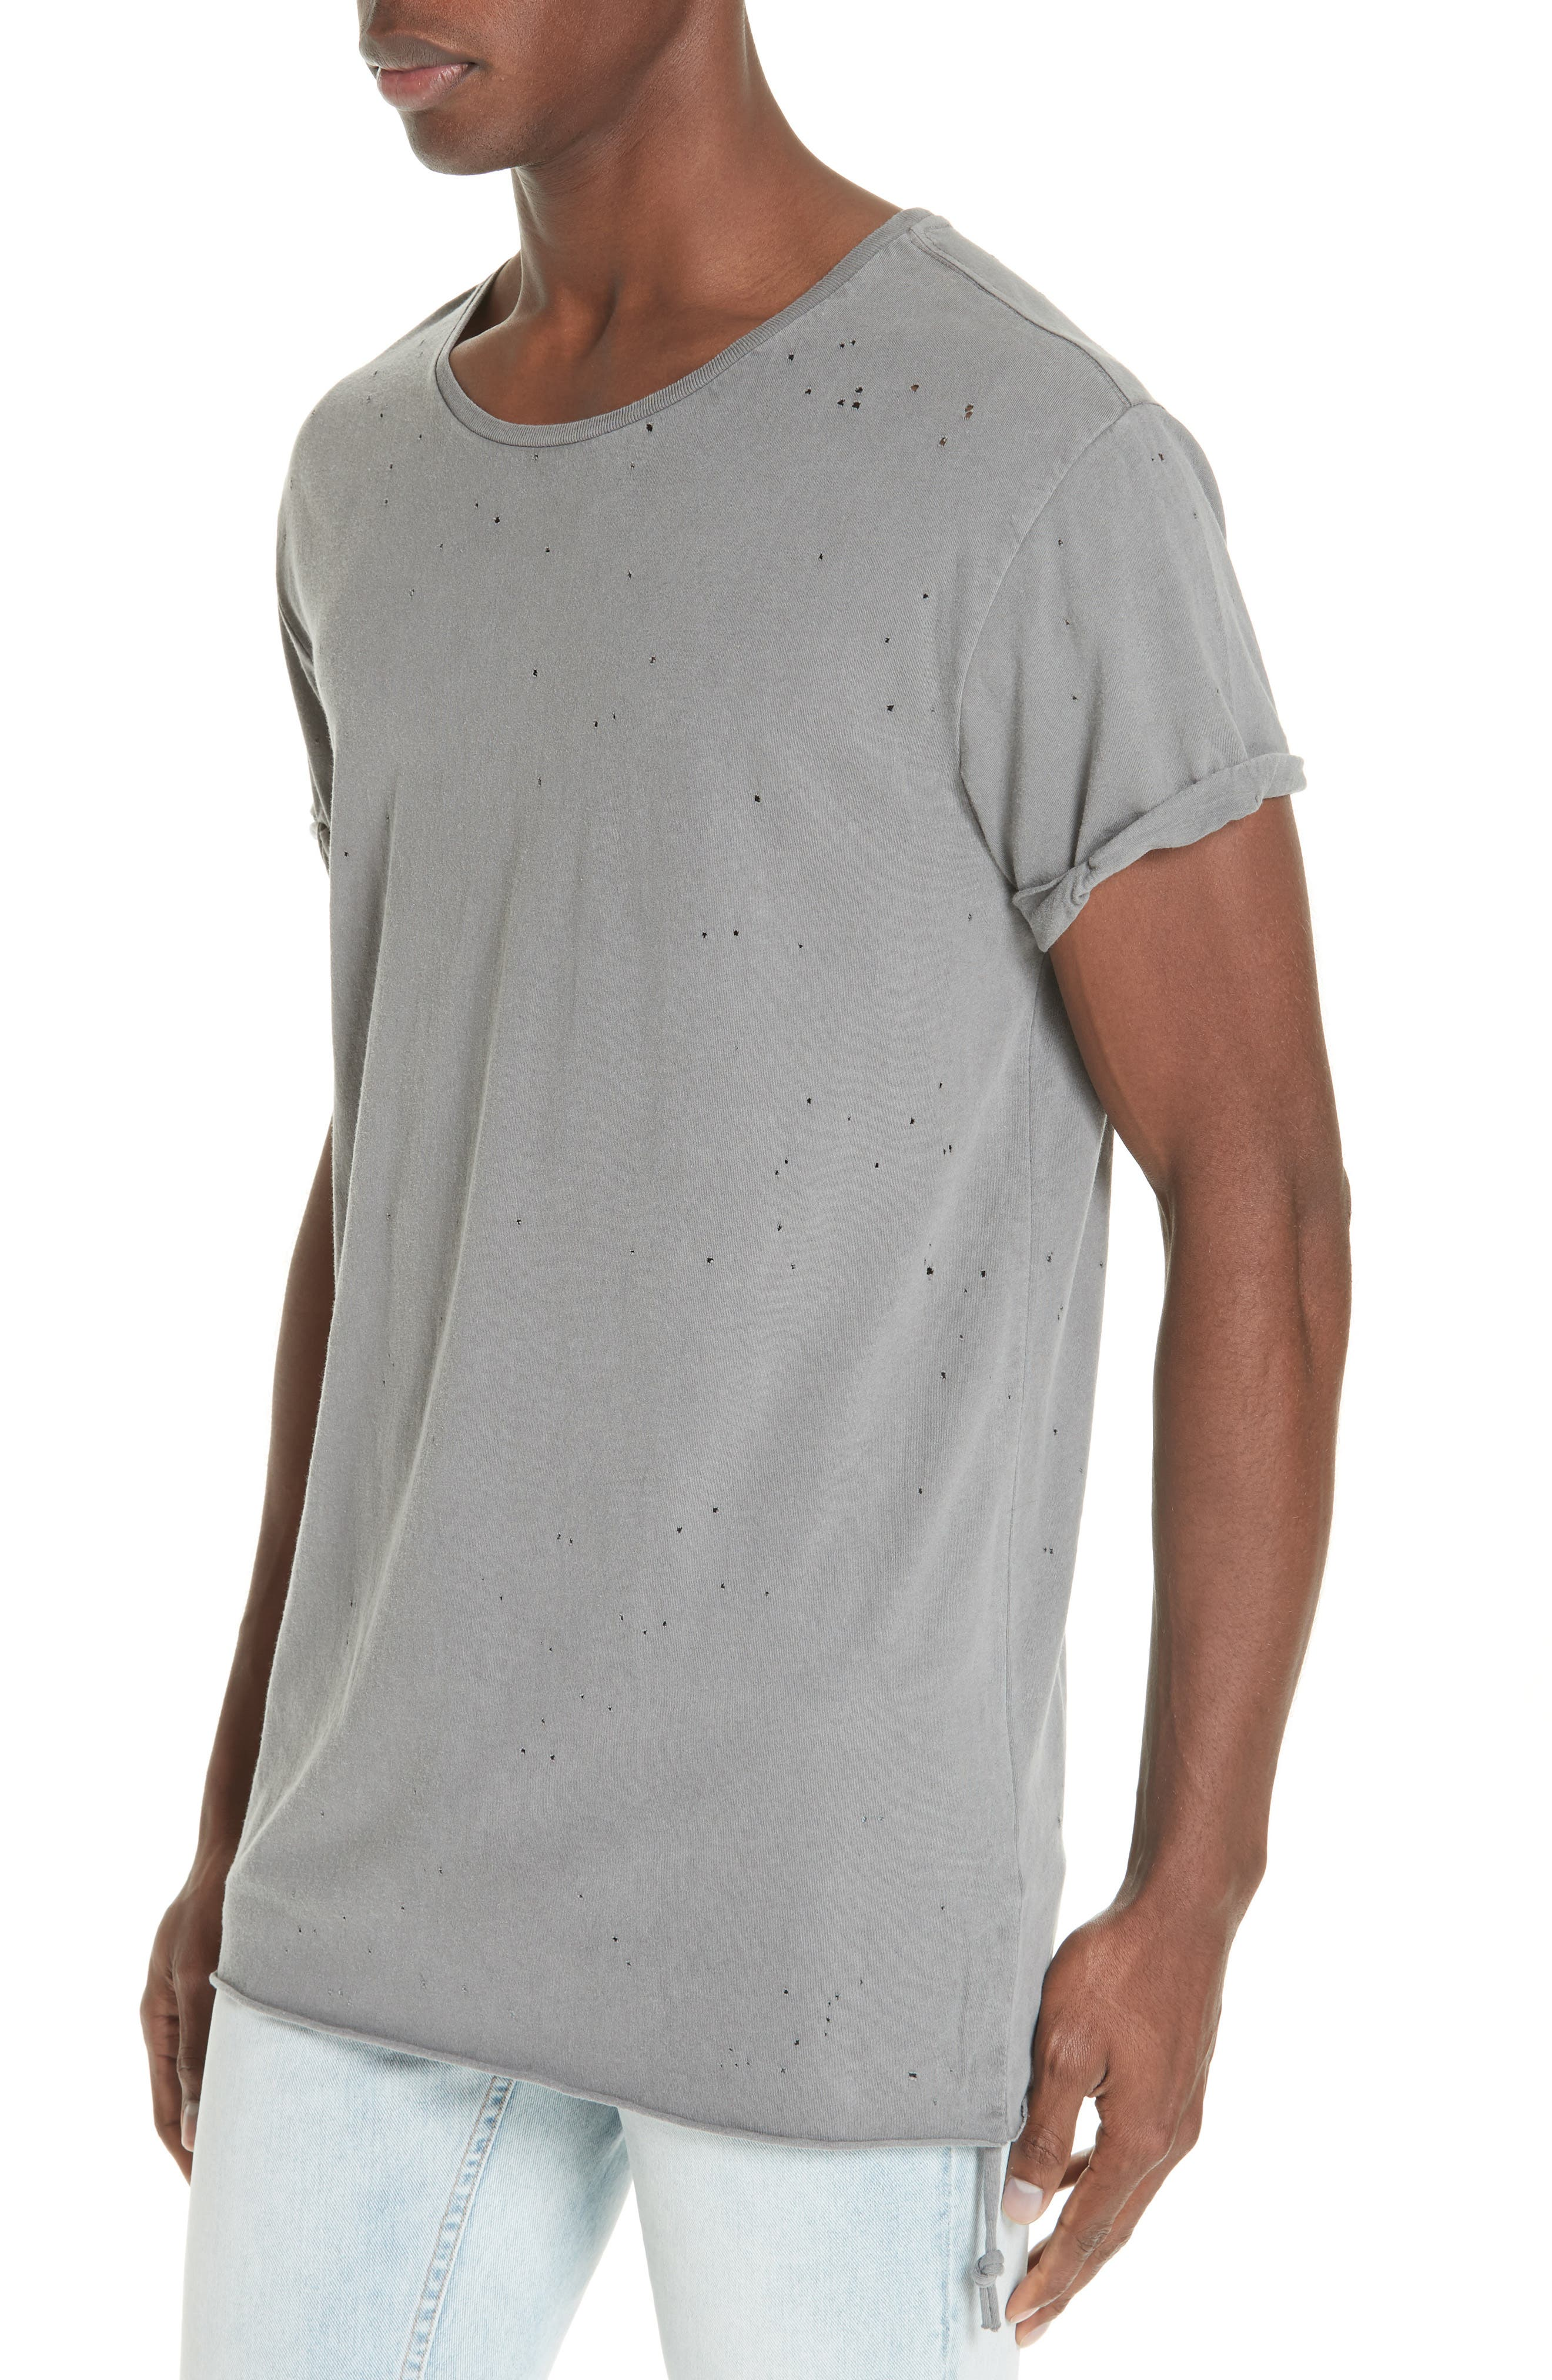 Kodeine Distressed T-Shirt,                             Alternate thumbnail 4, color,                             GREY